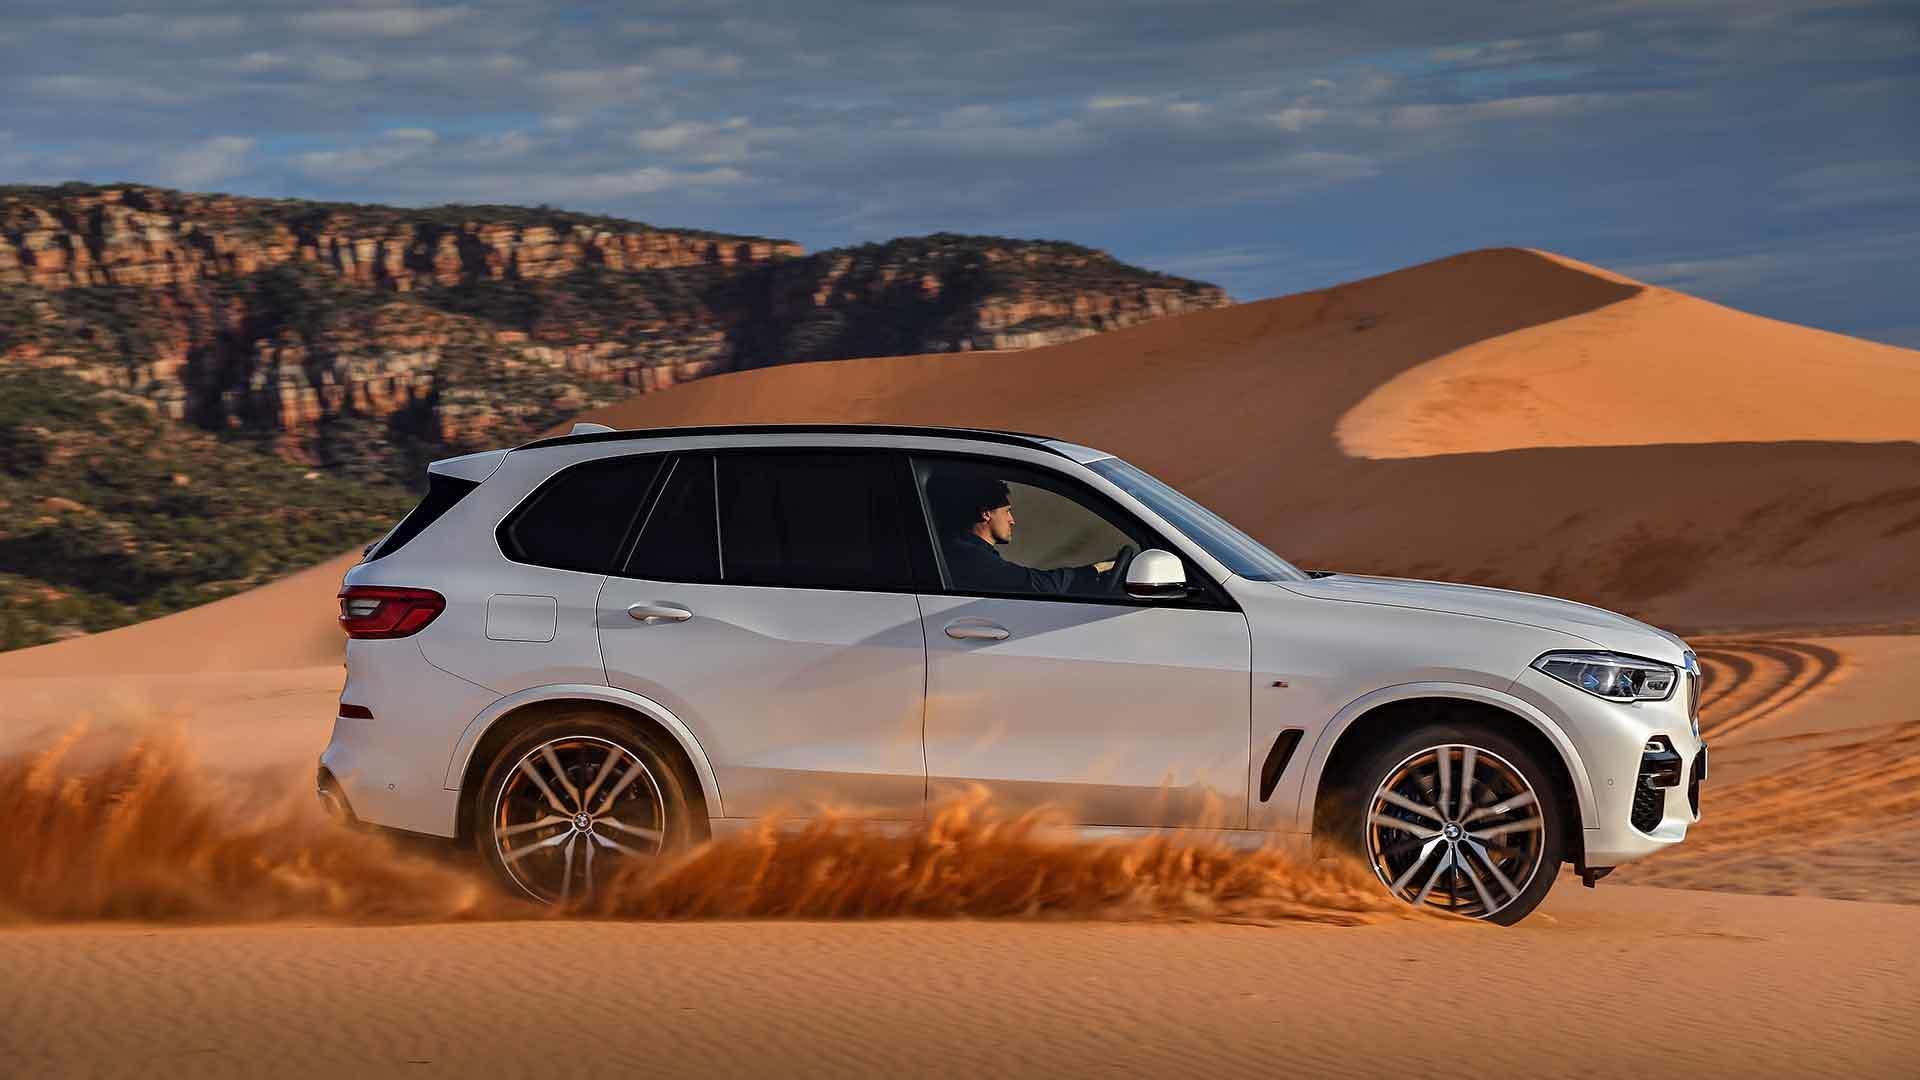 BMW-X5-G05-2019-10.jpg